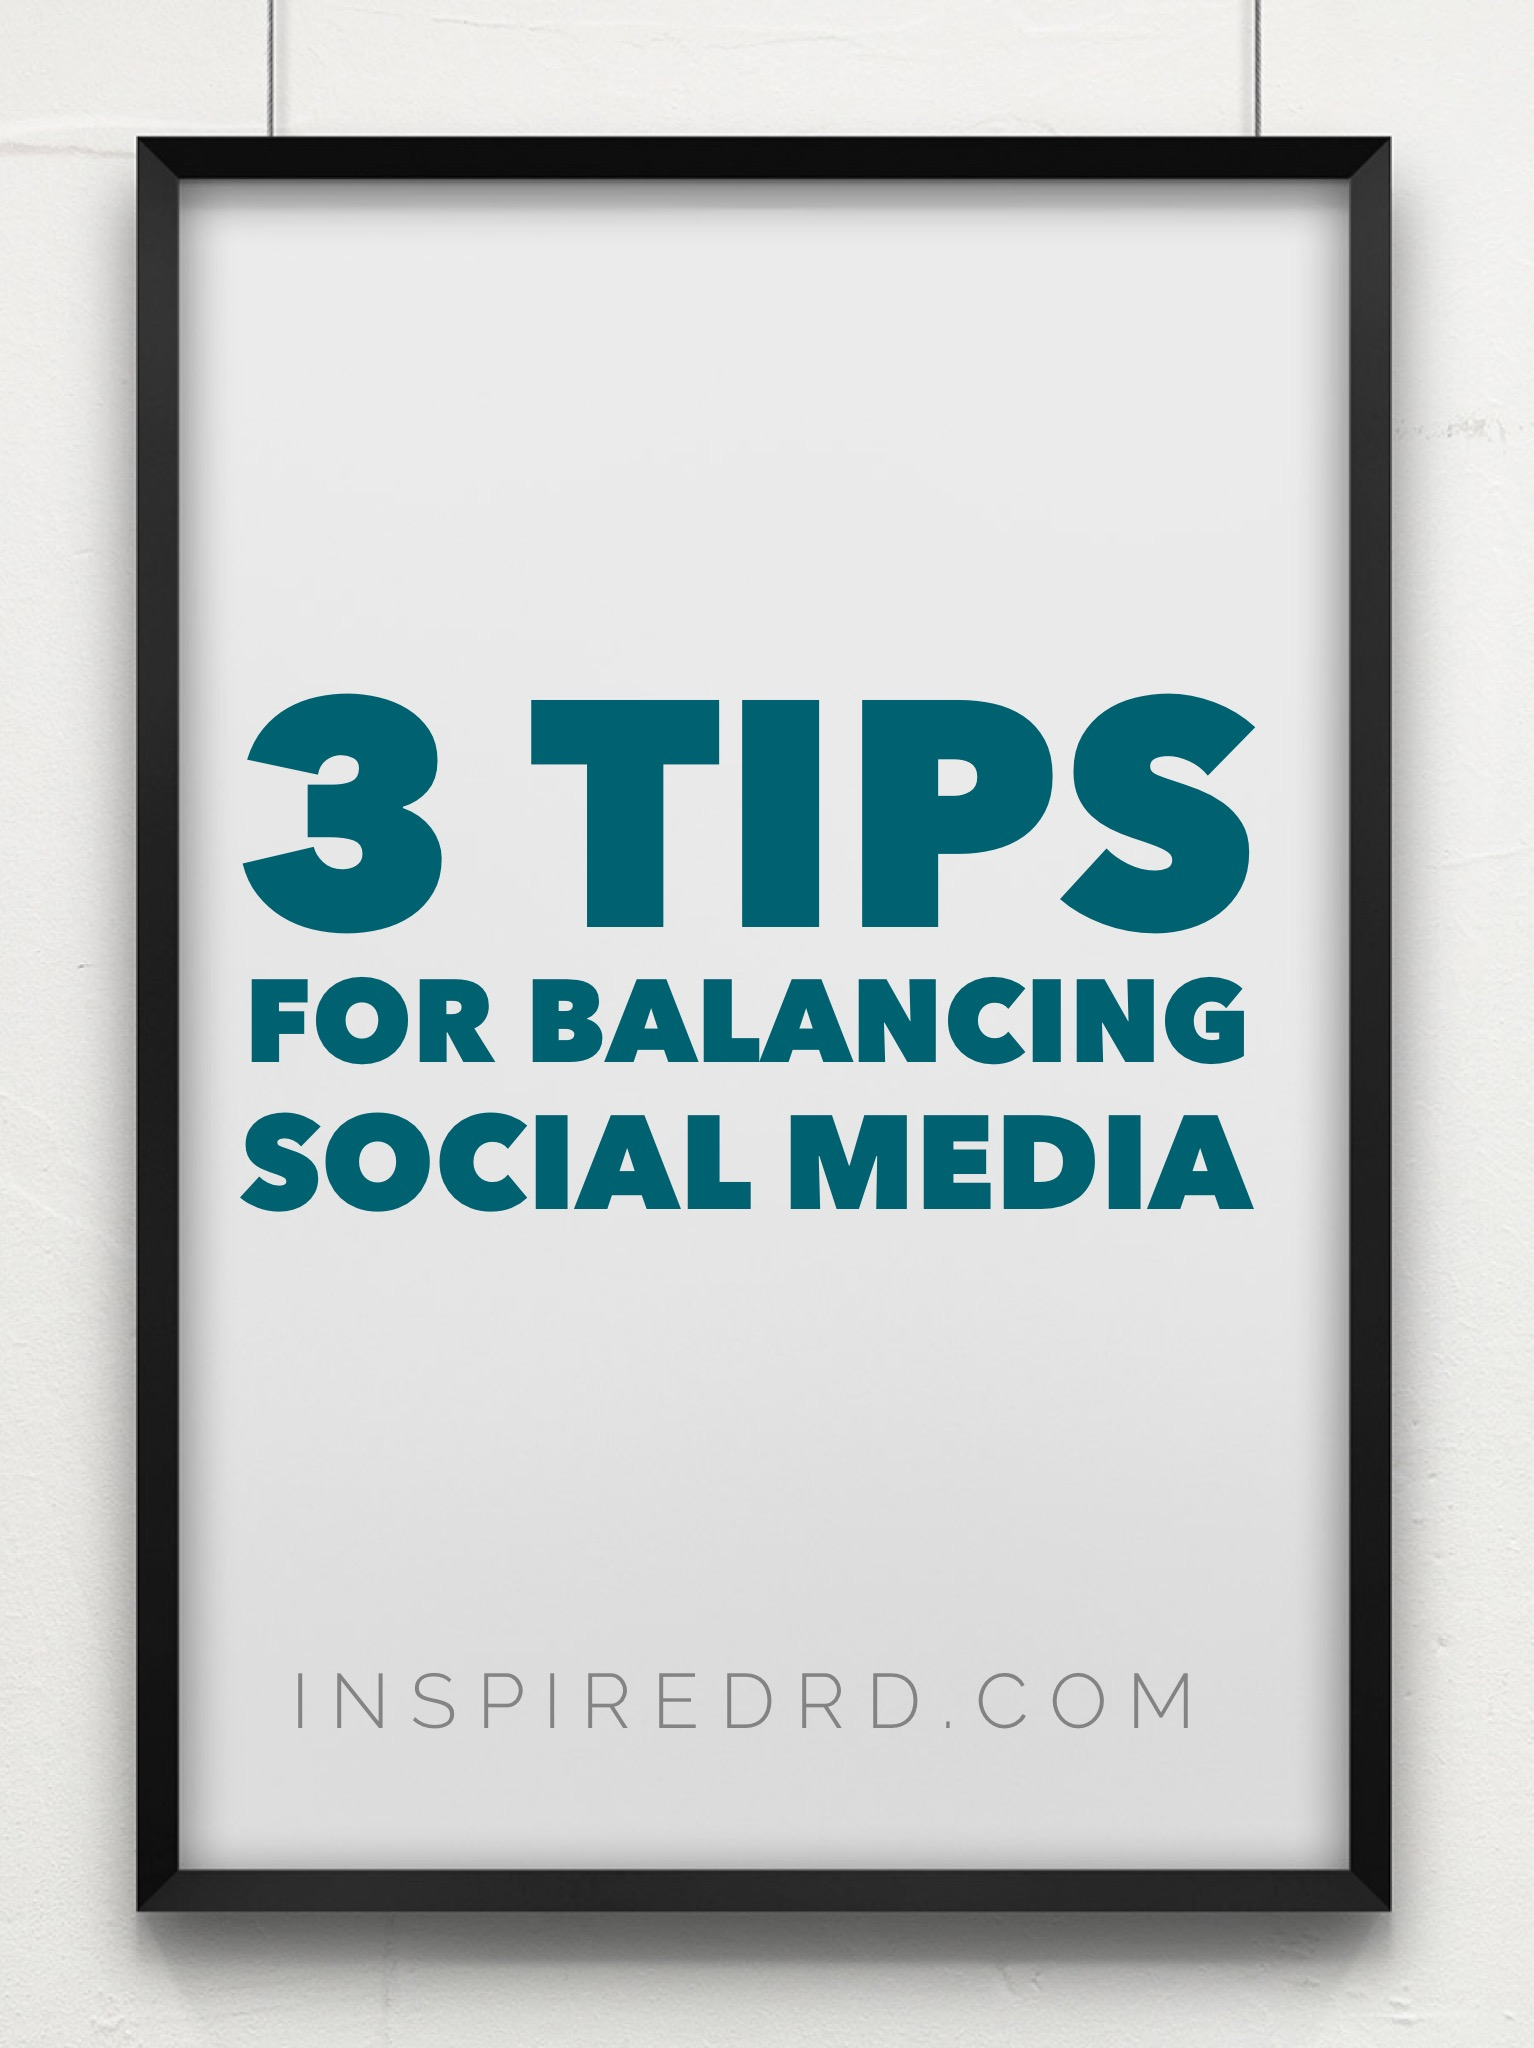 3 Tips for Balancing Social Media